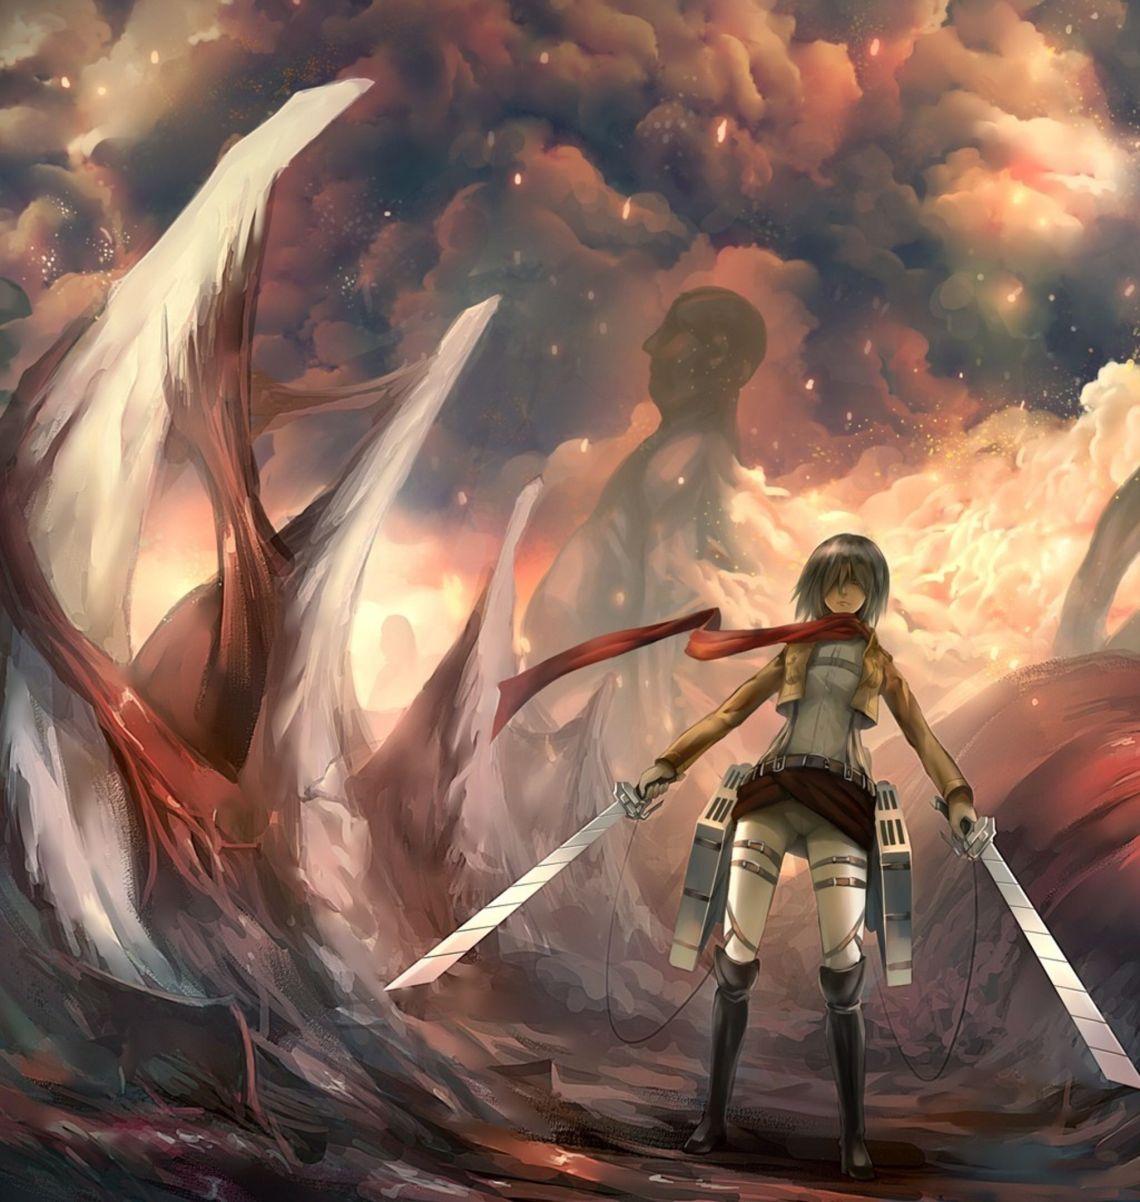 Anime Wallpaper 4k Attack On Titan